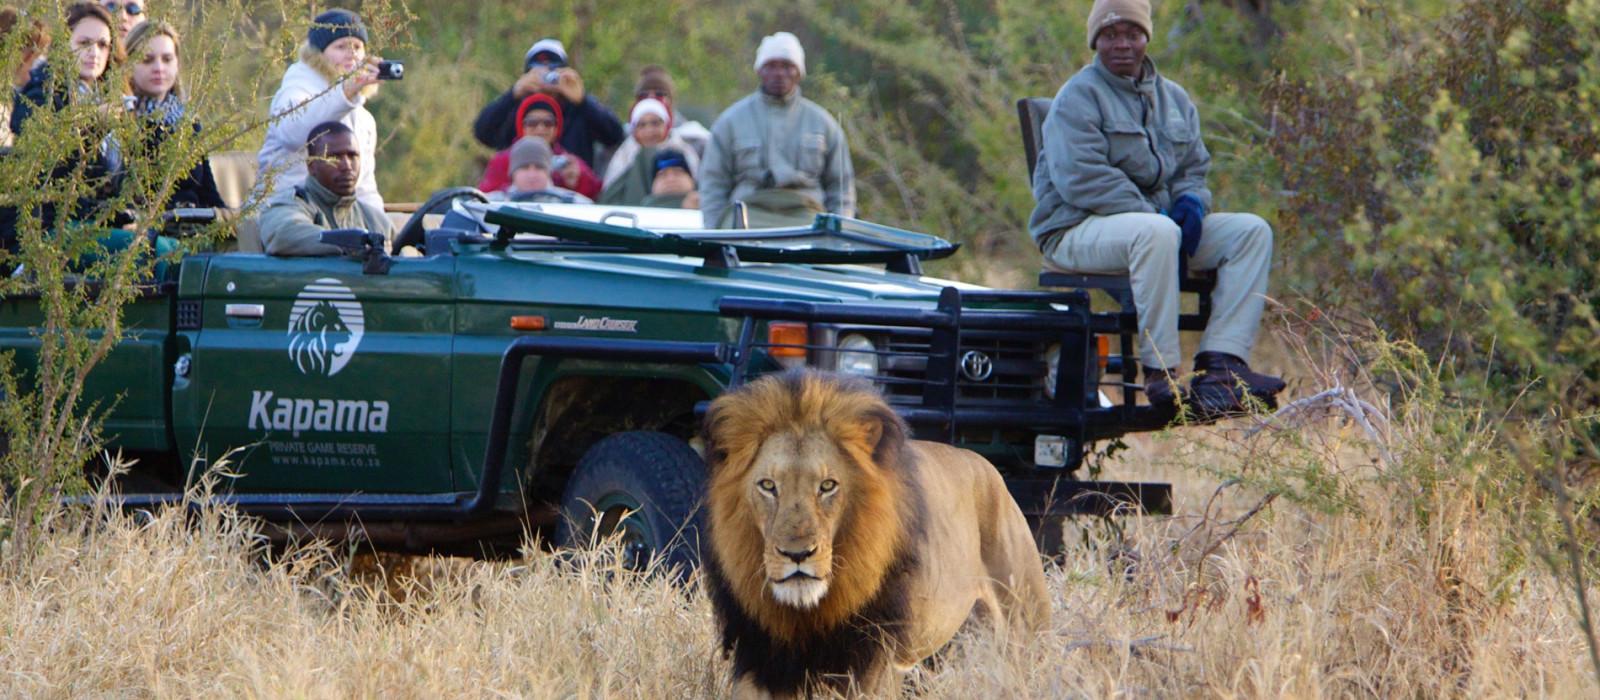 Hotel Kapama Southern Camp South Africa